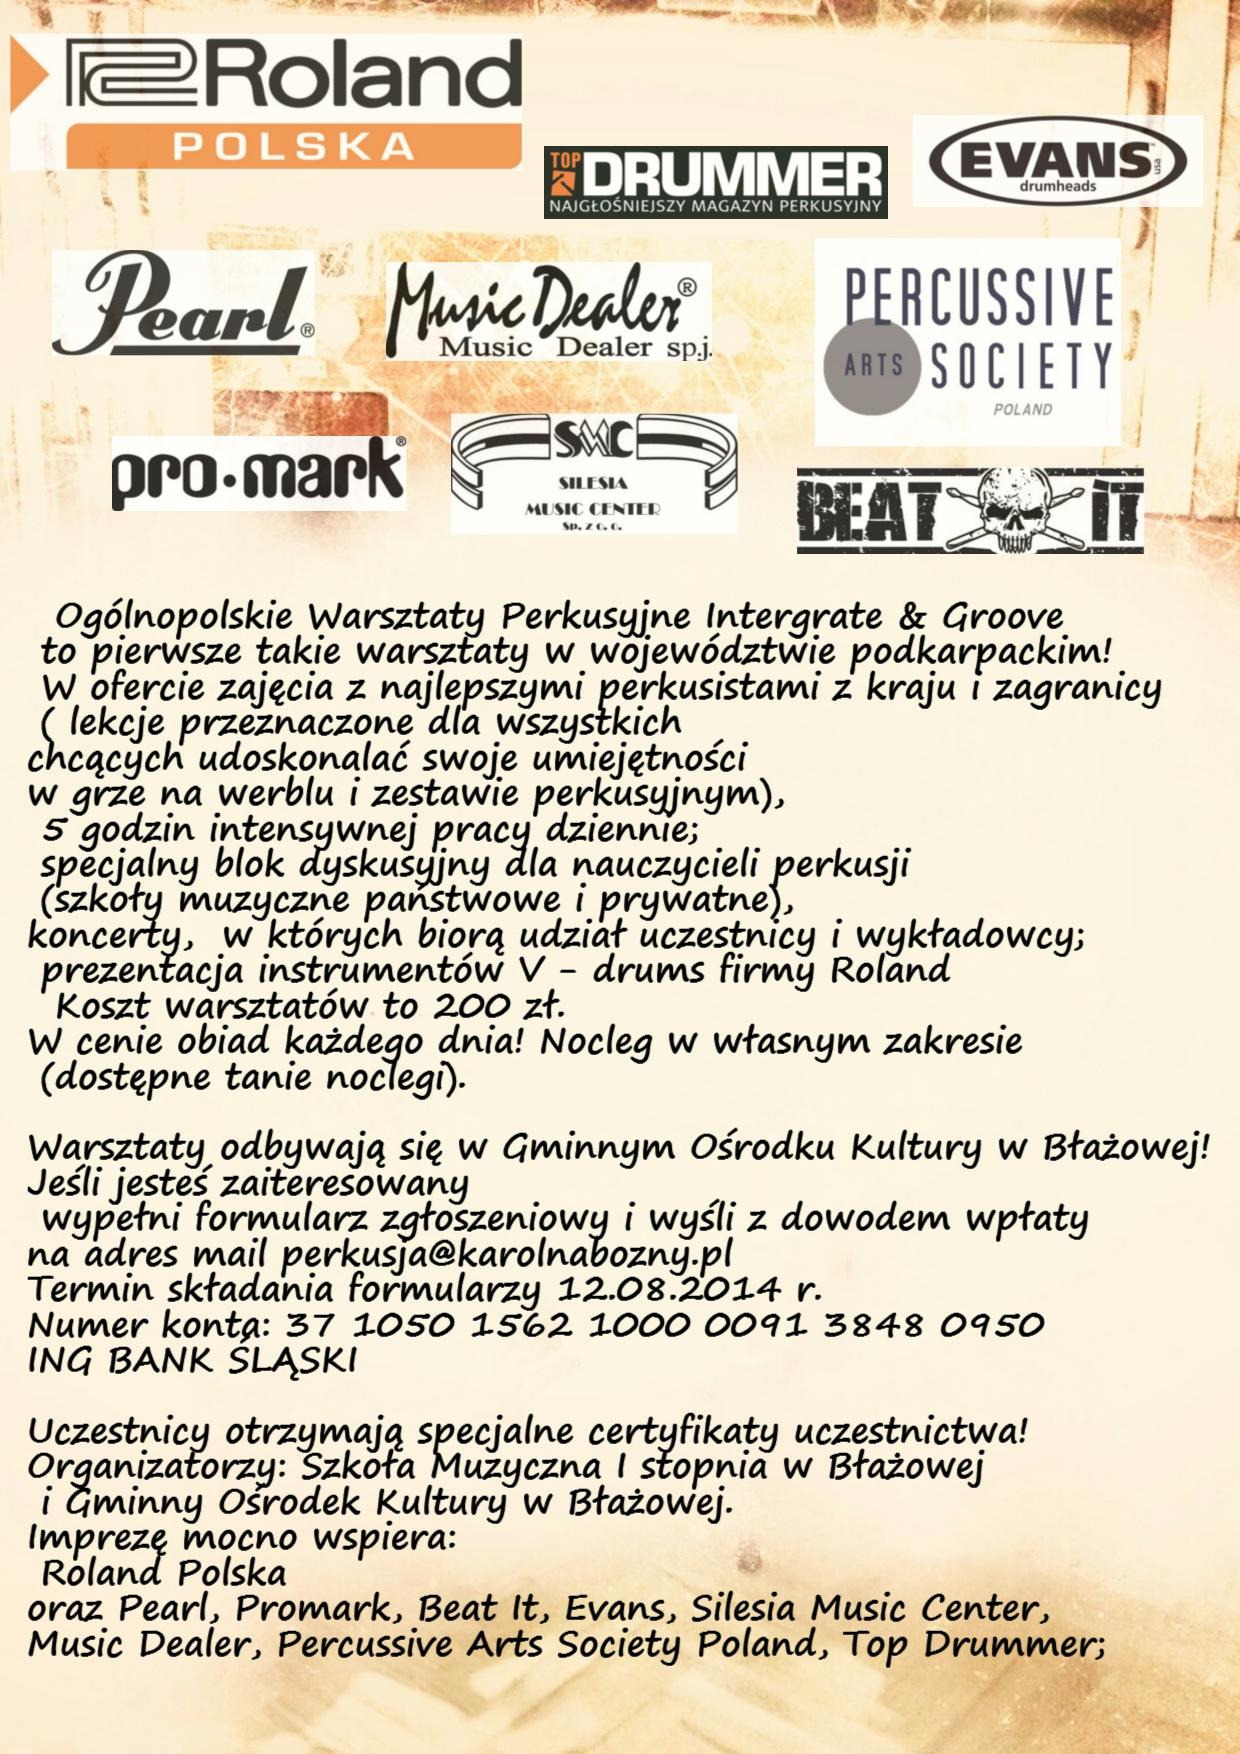 Integate & Groove 2 info